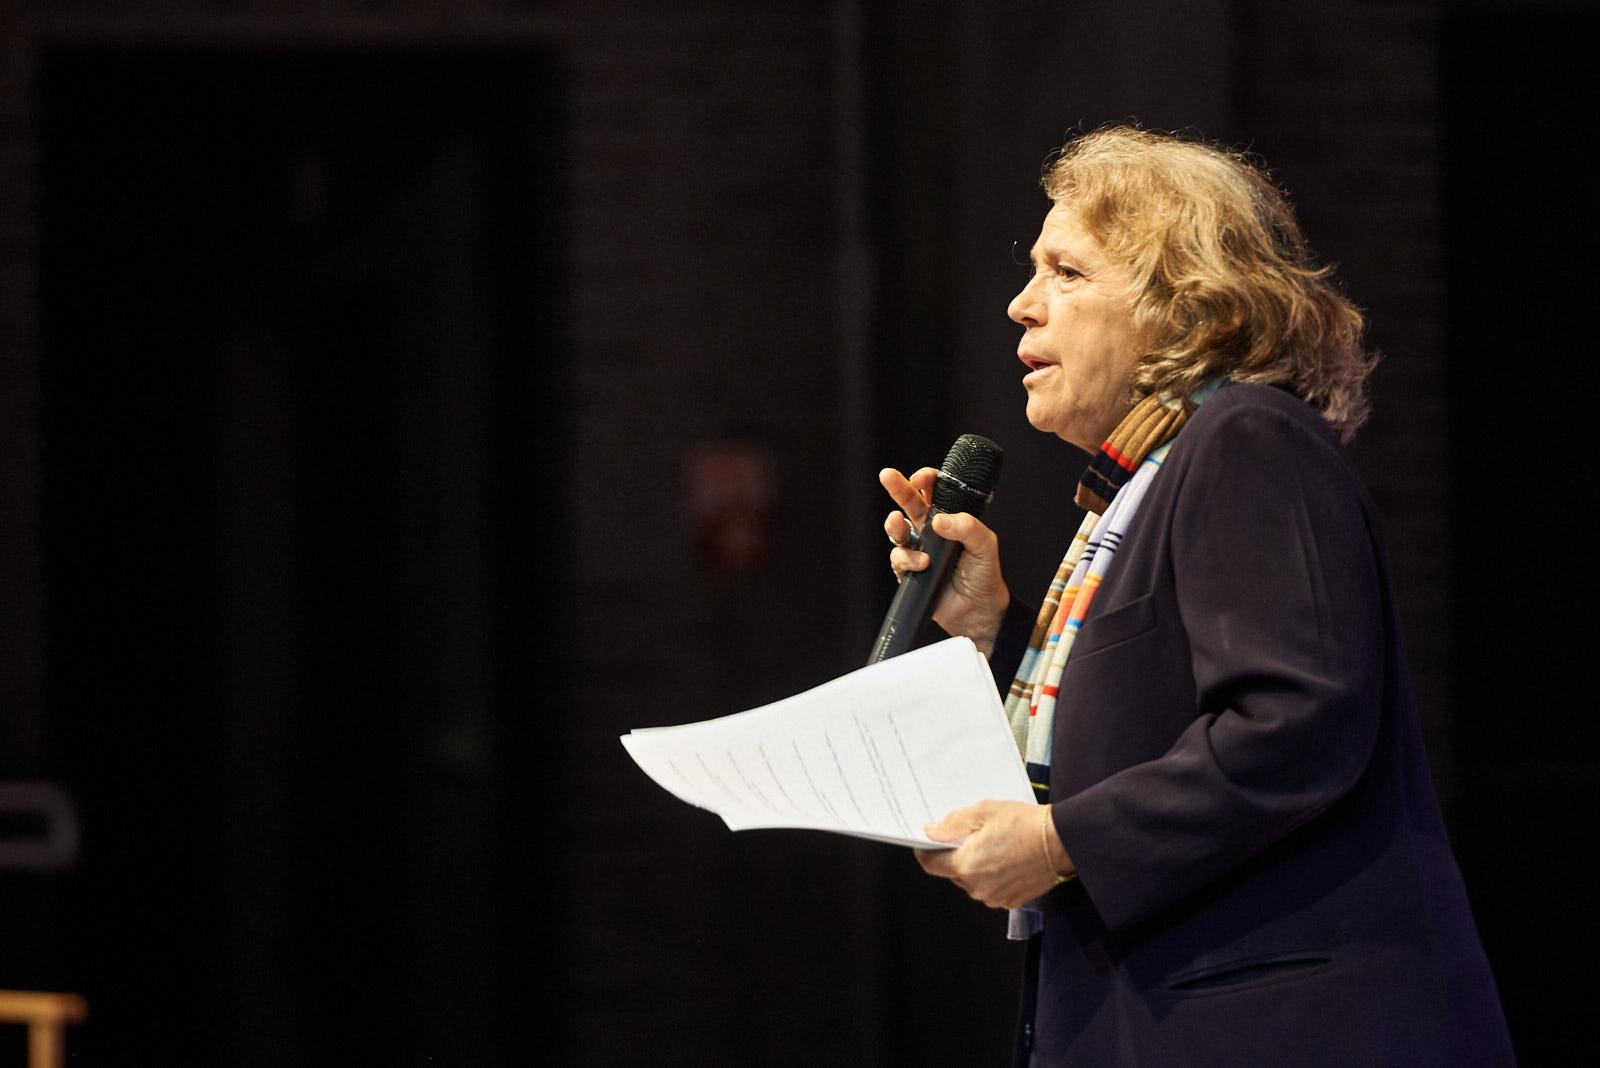 Andrée Ruth Shammah introduce la serata